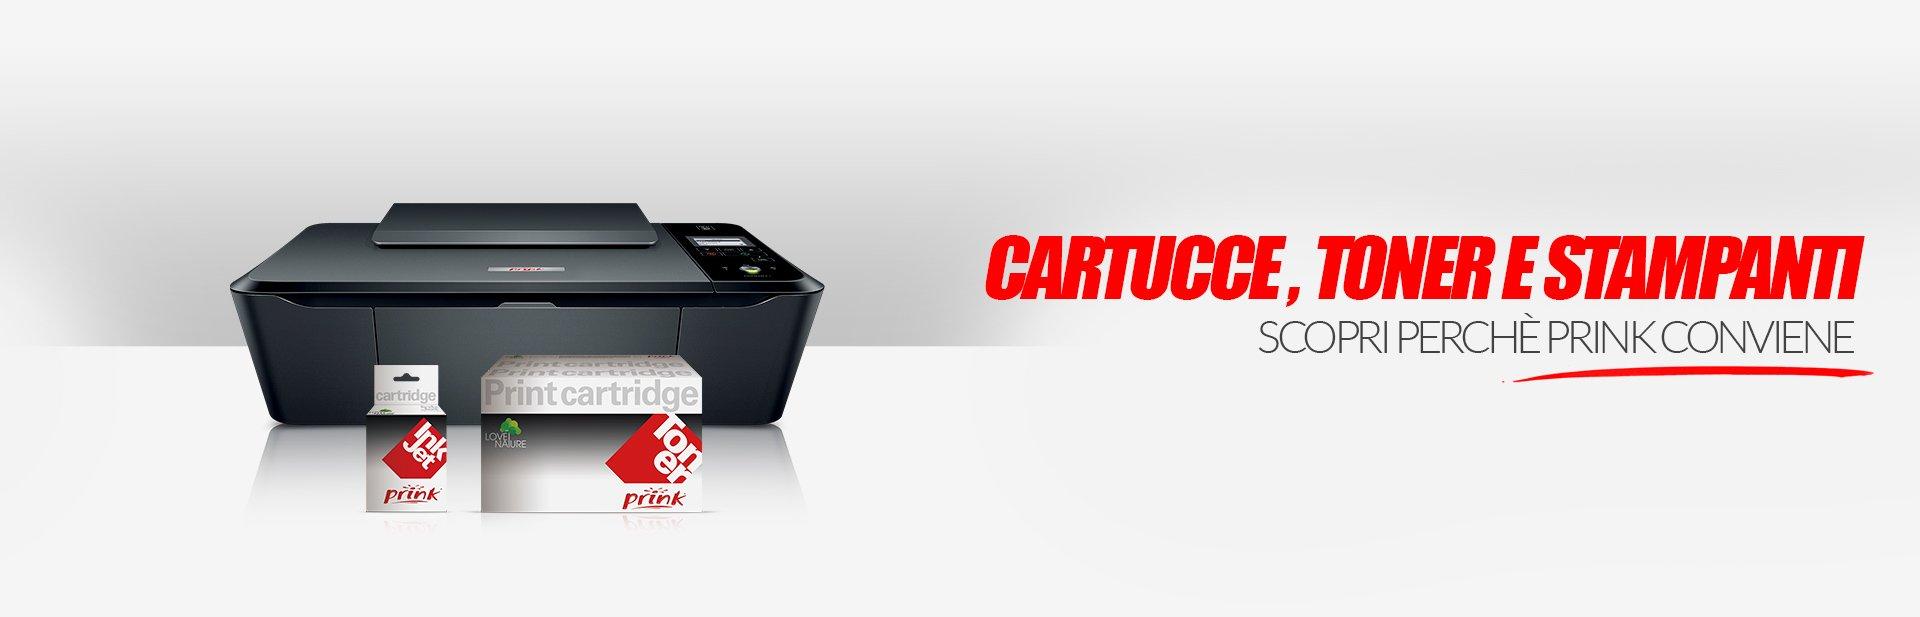 Prink-cartucce-toner-carta-stampanti-SL2